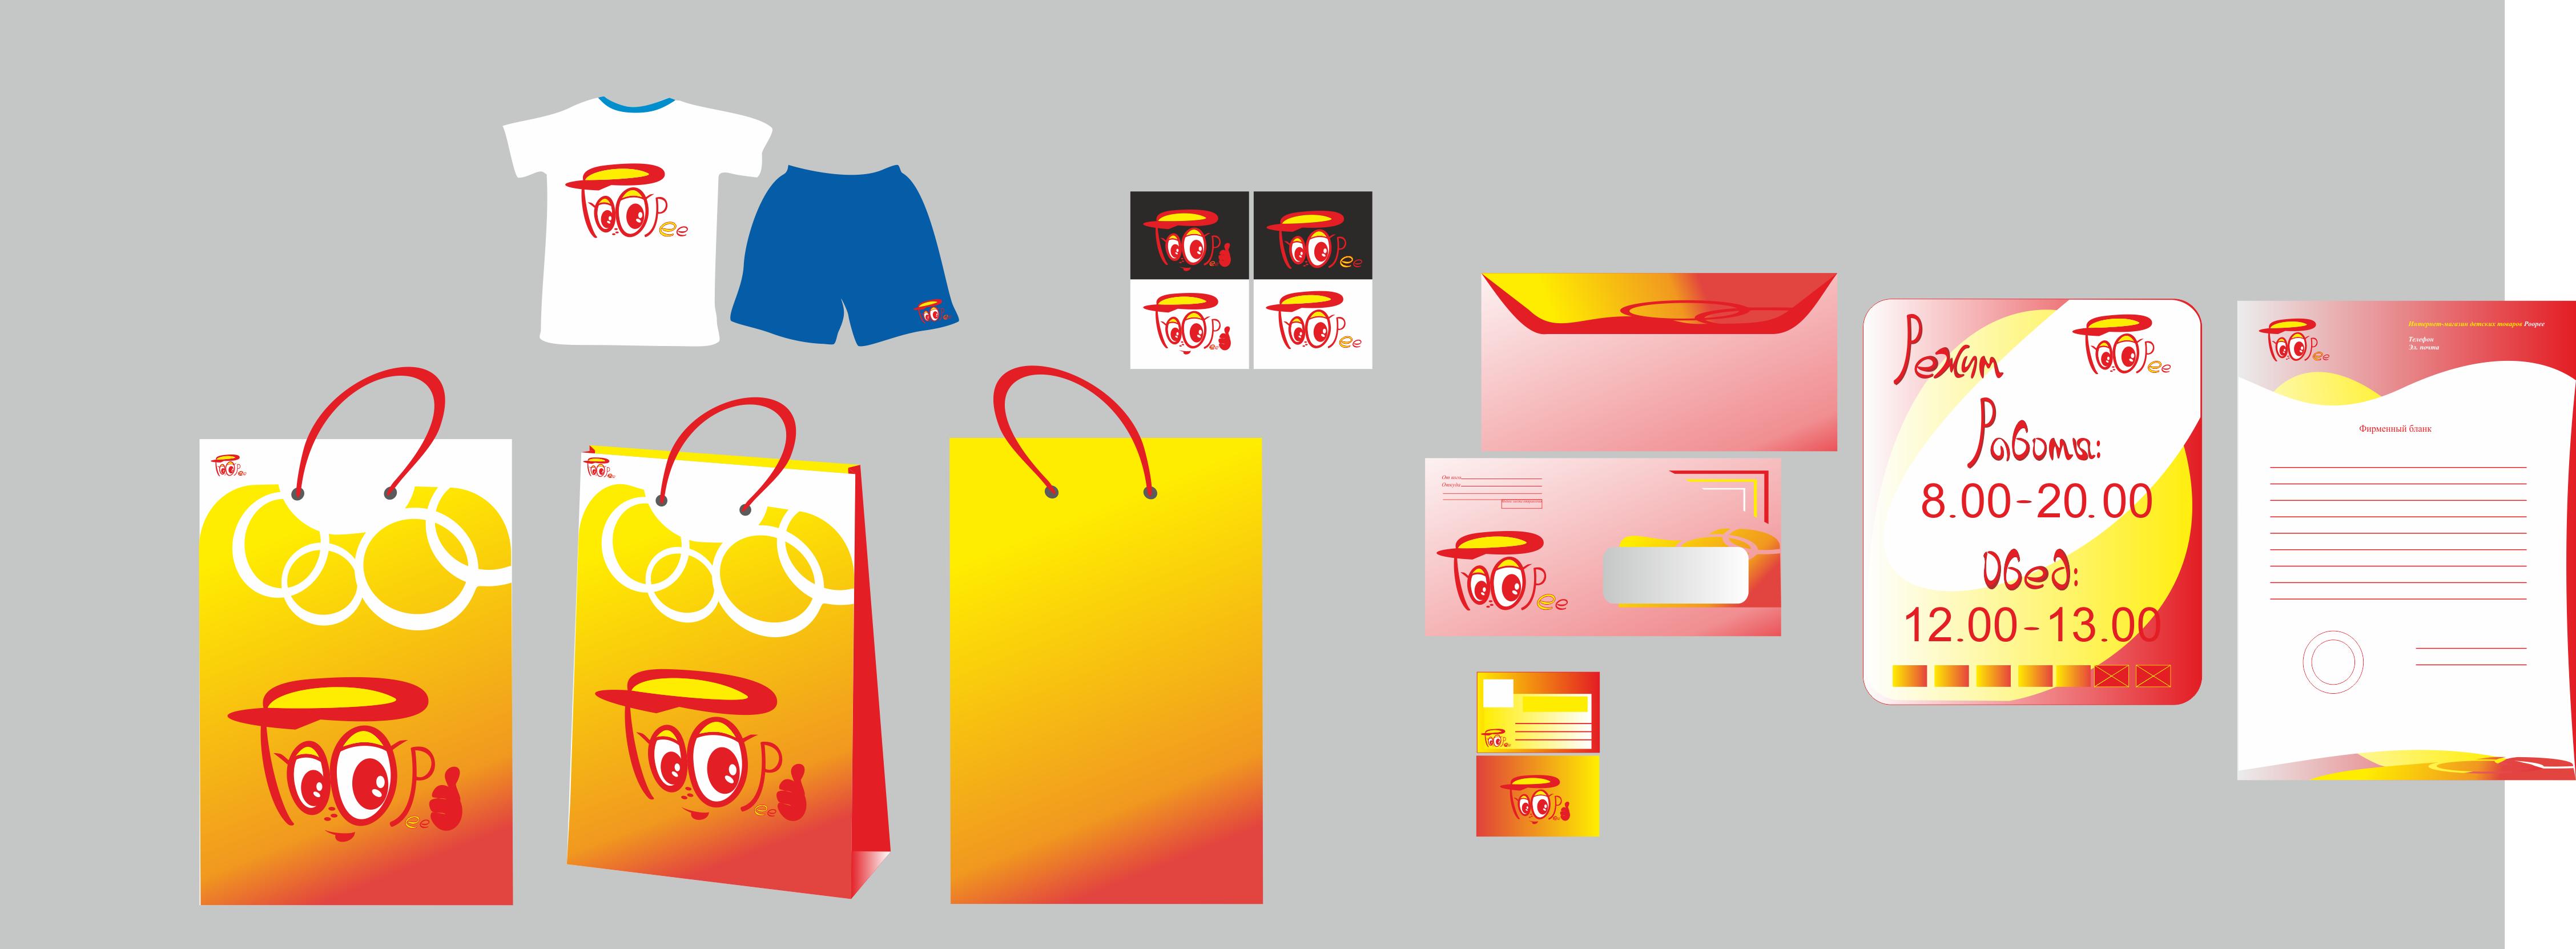 Разработка элементов фирменного стиля, логотипа и гайдлайна  фото f_8045af054fb76859.png